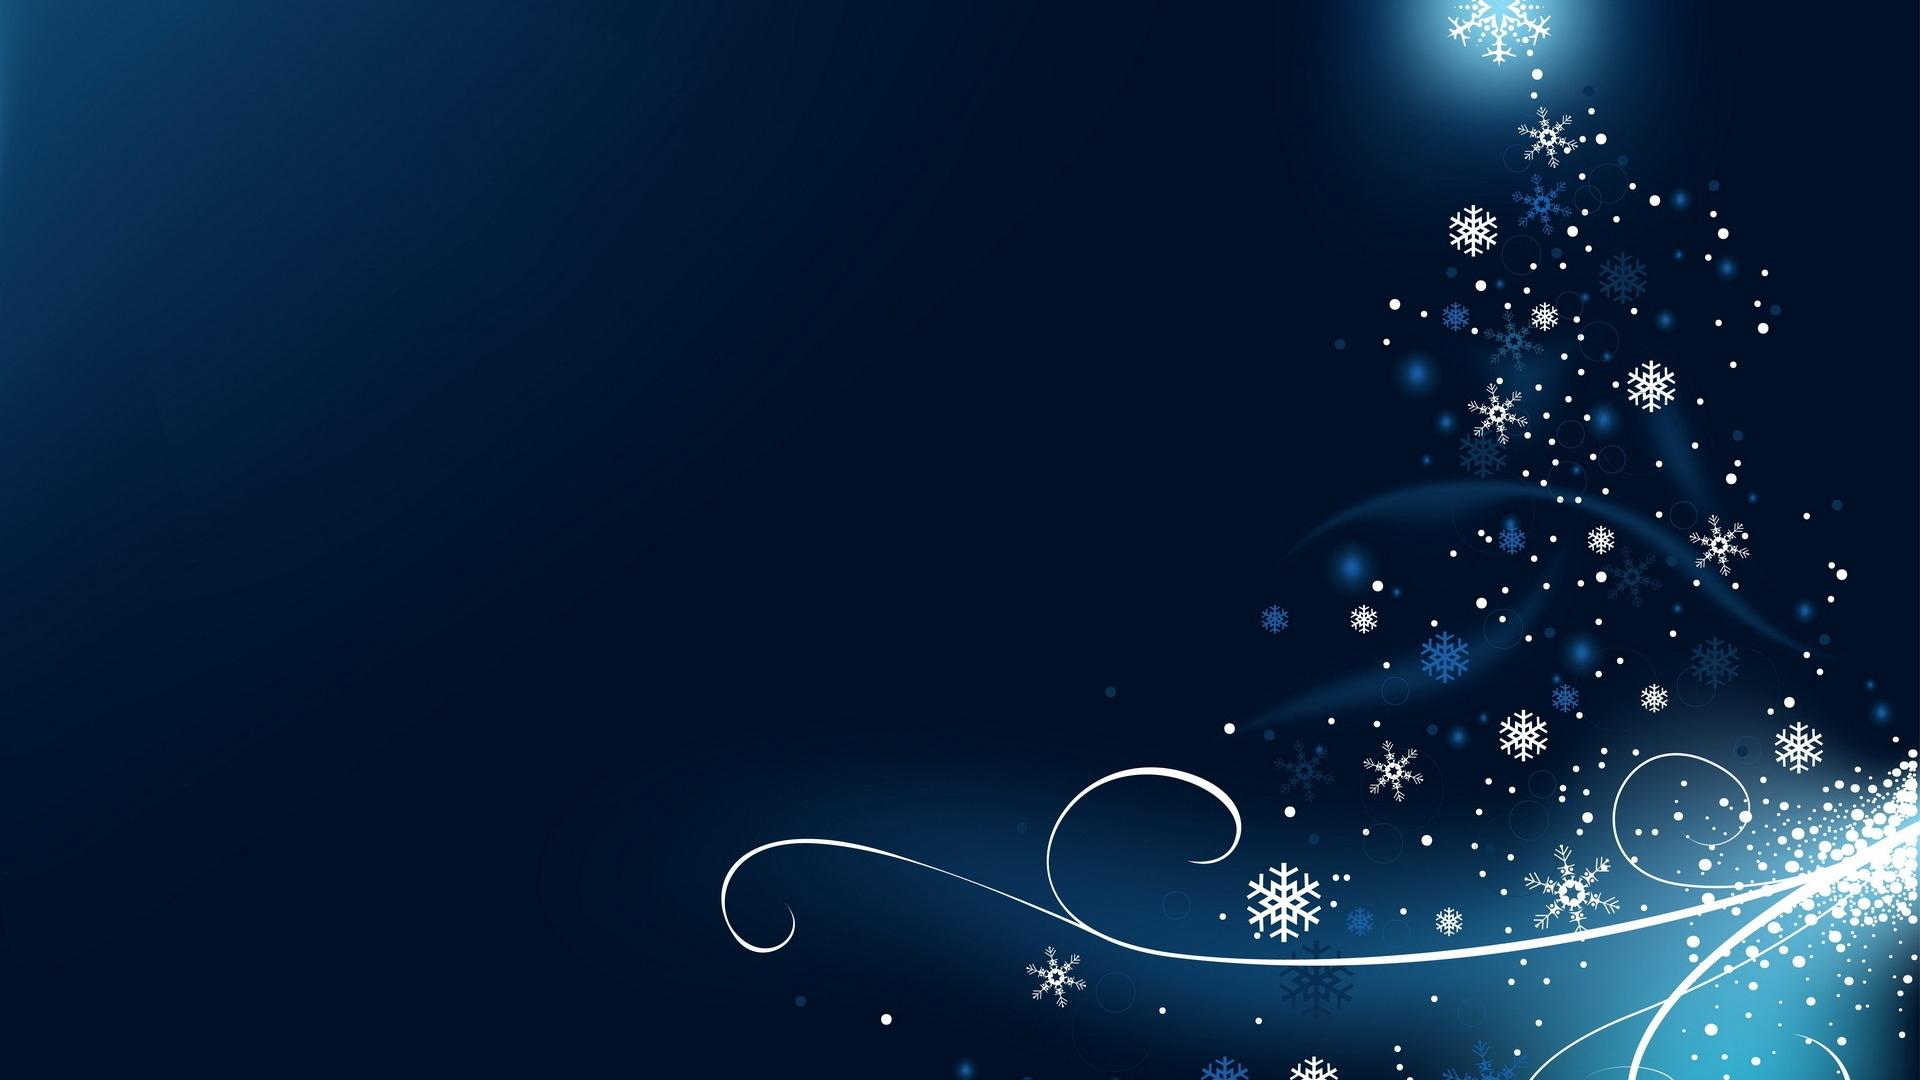 Google themes blue - Google Chrome Themes Christmas Snowflake Theme